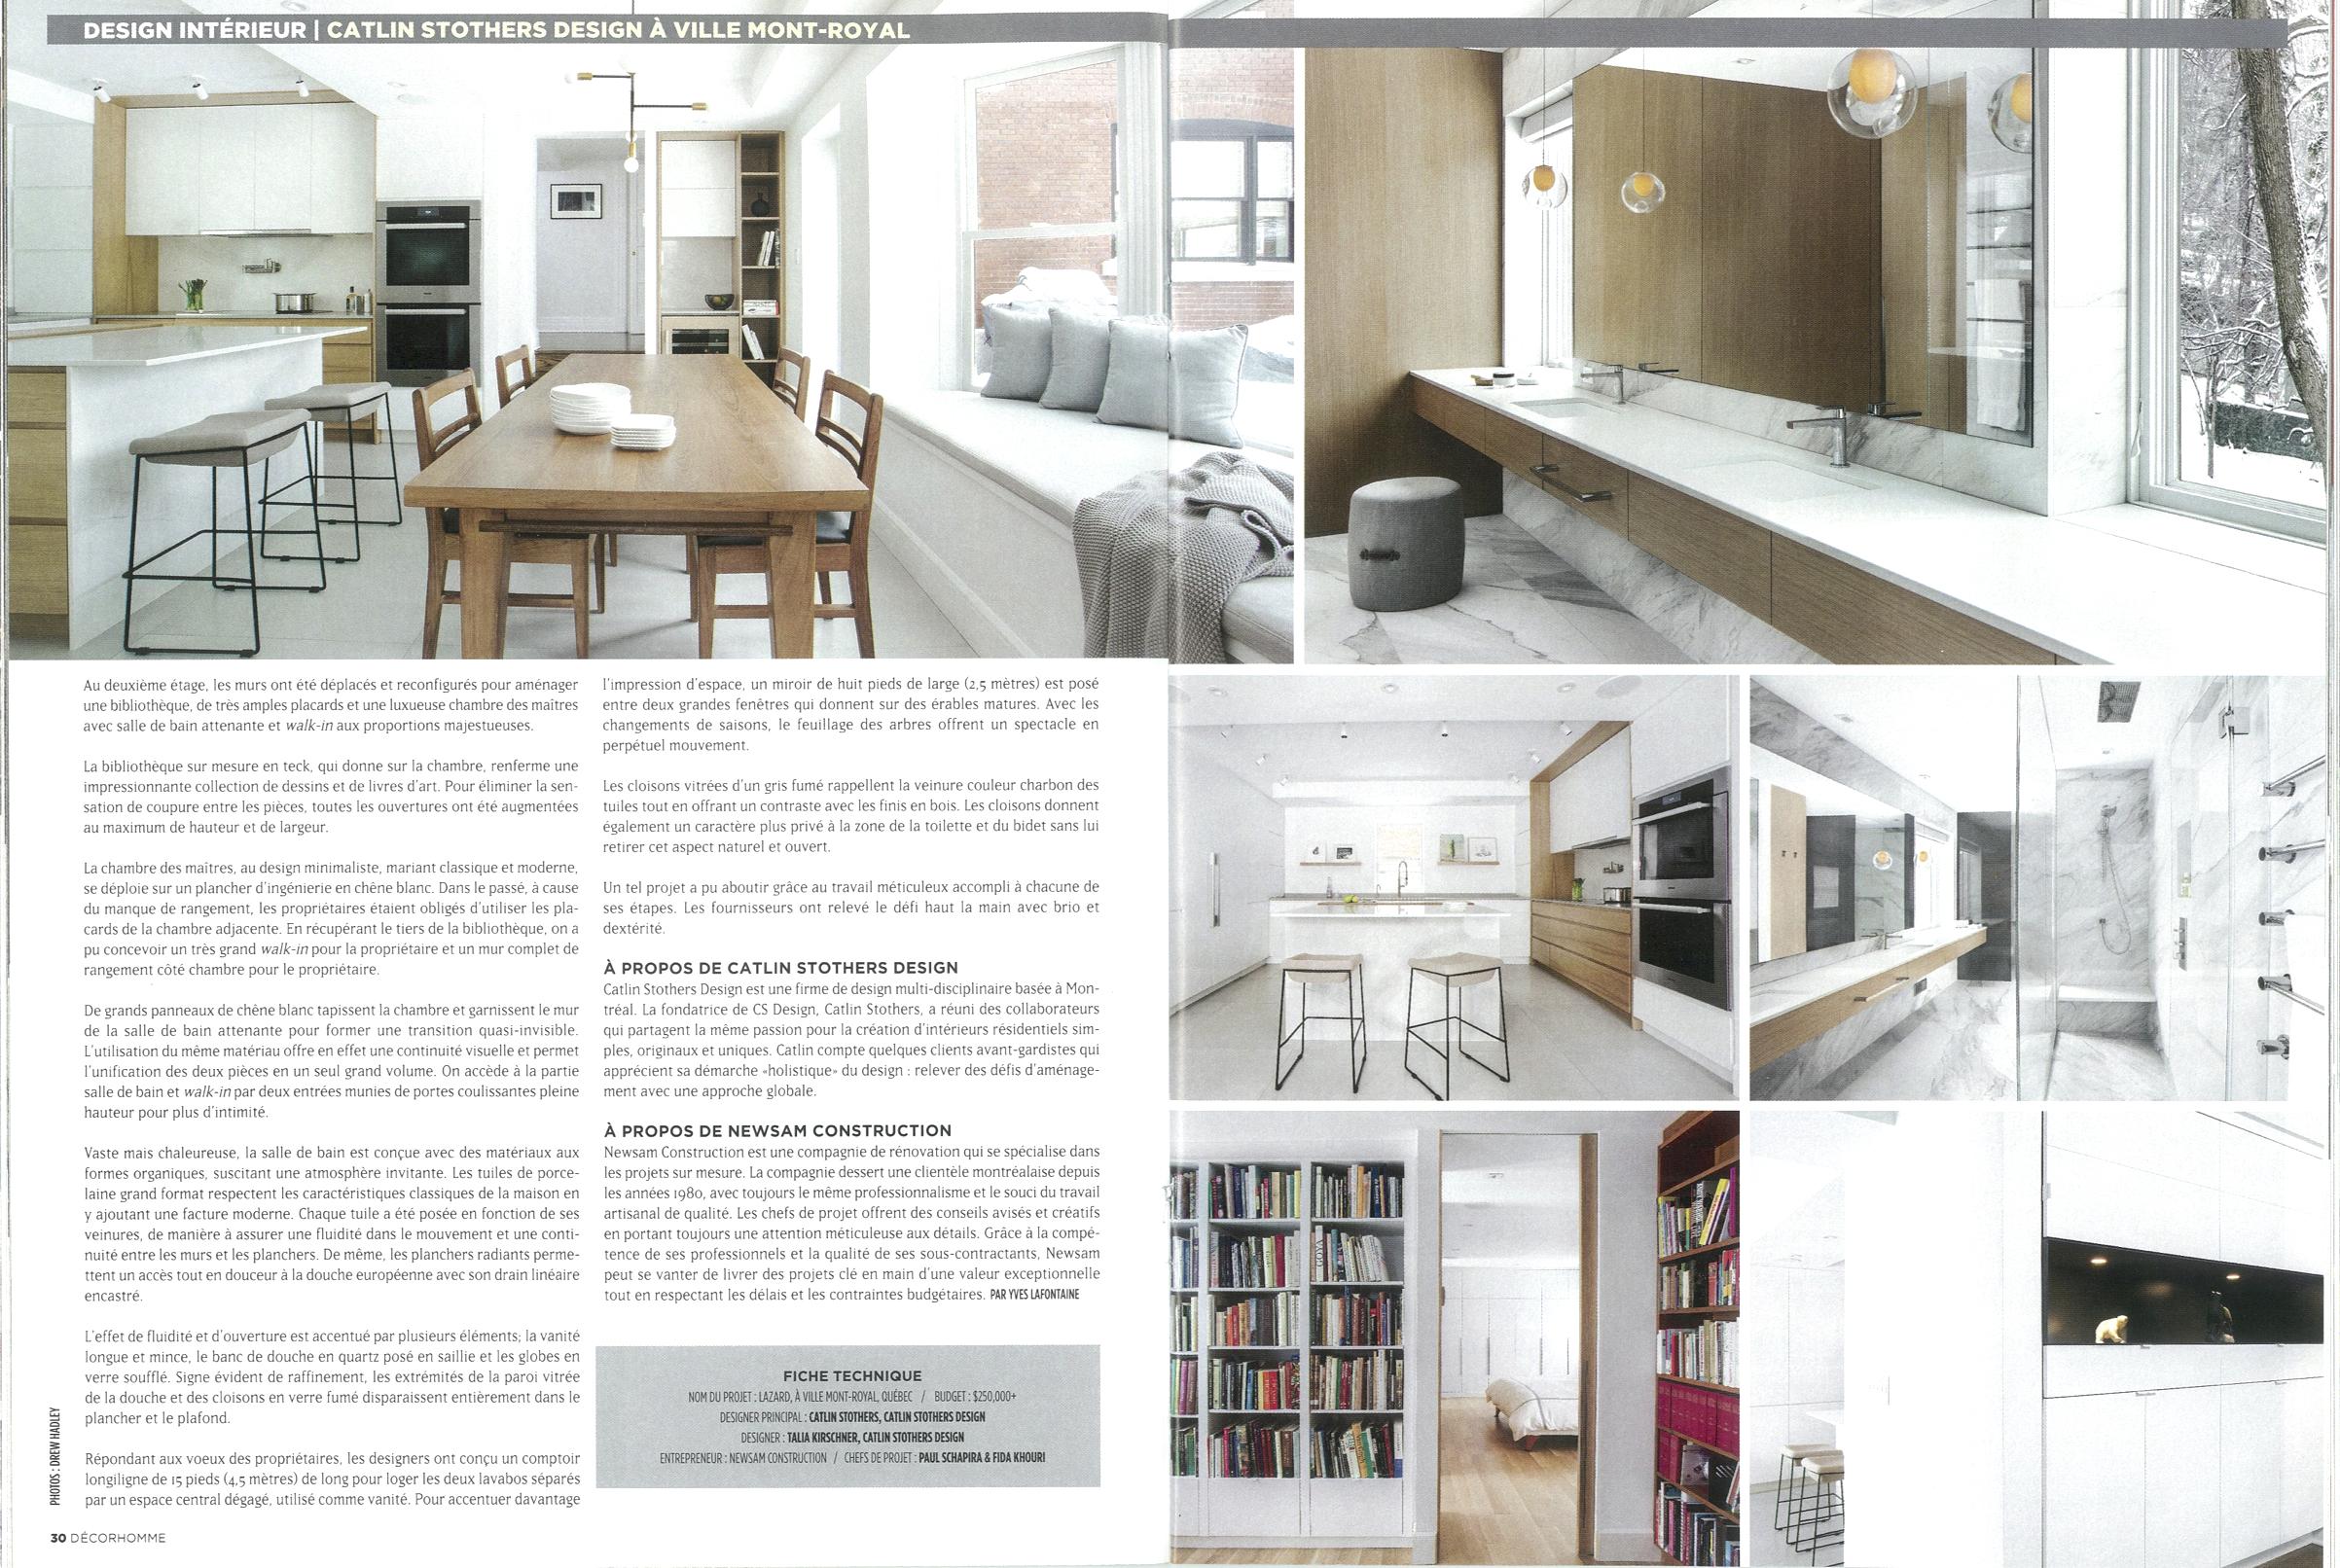 Tuile En Bois Nom lazard — catlin stothers design